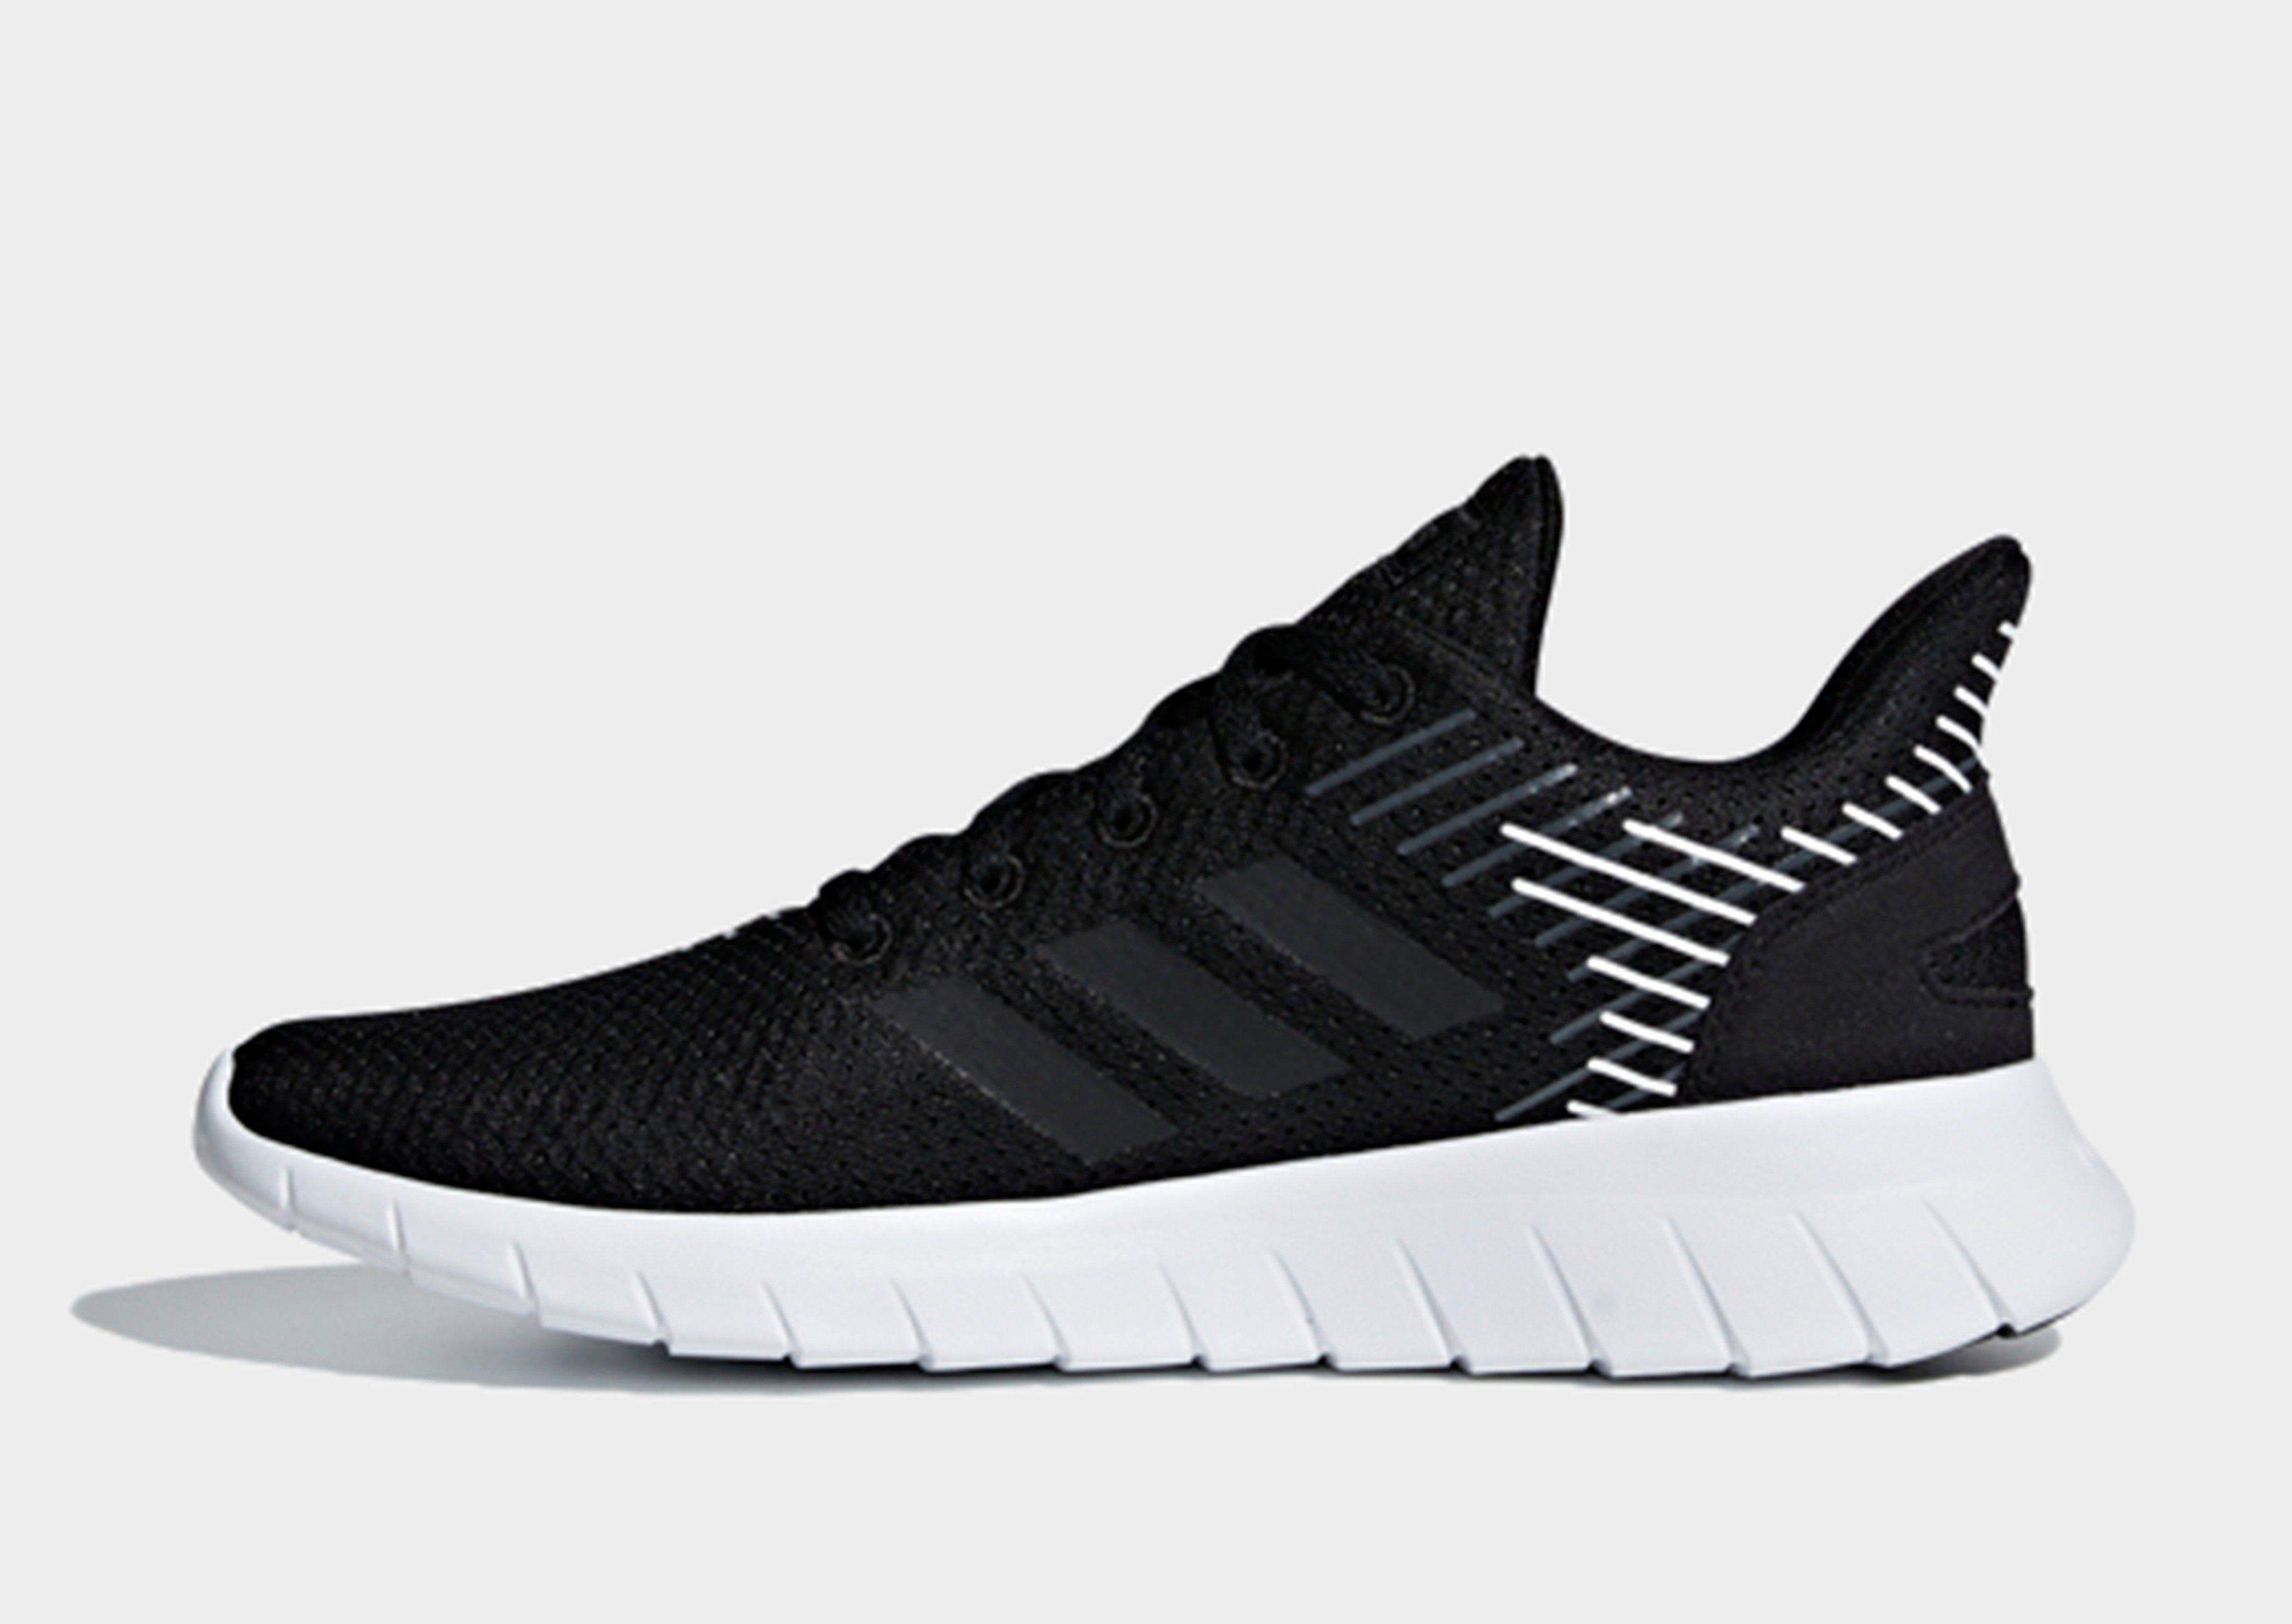 buy popular f4b61 5baa8 ADIDAS Asweerun Shoes   JD Sports